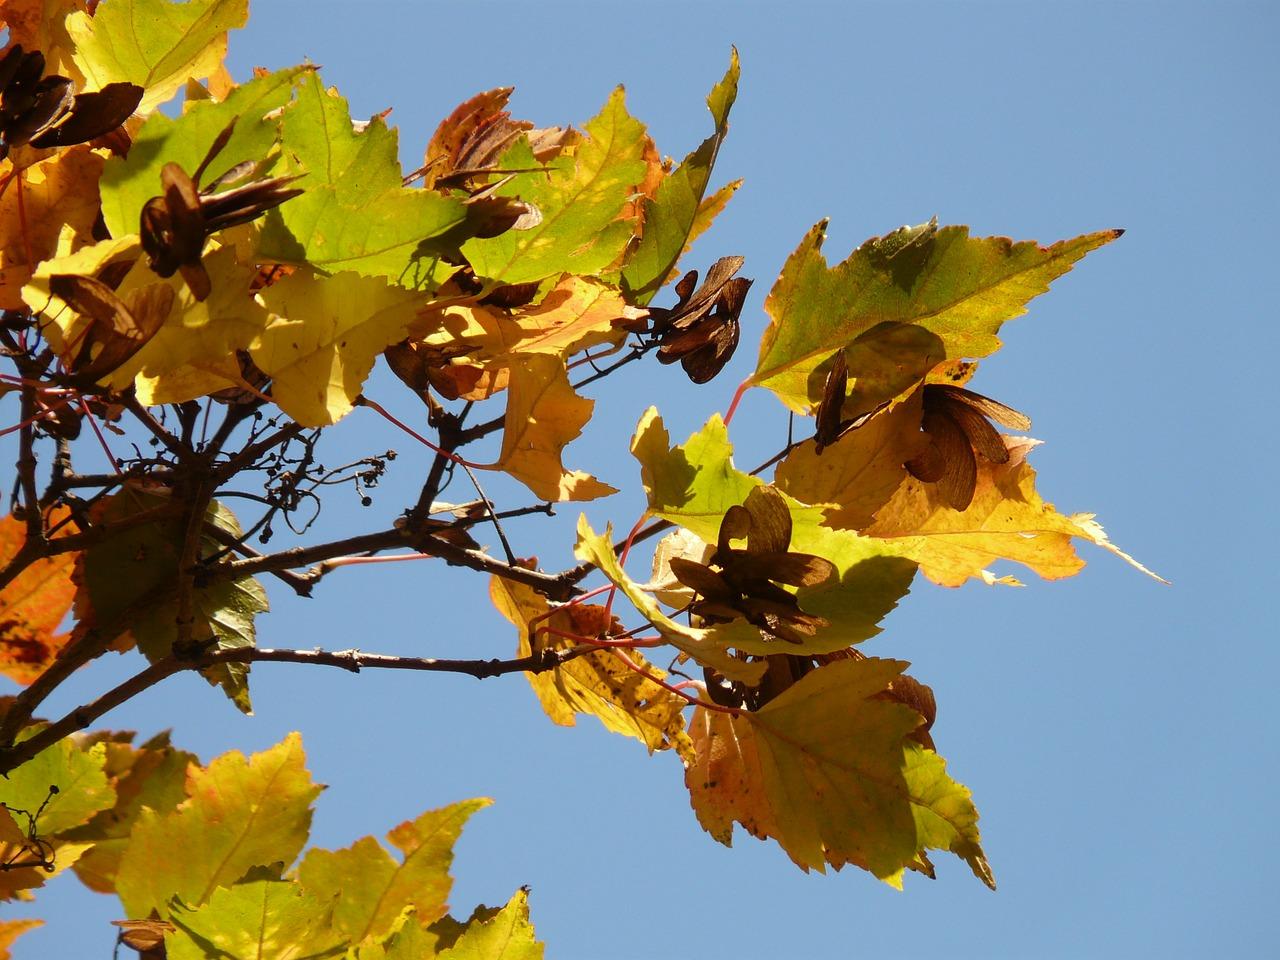 Fire Mapleautumnsmall Leaffall Foliageacer Tataricum Subsp